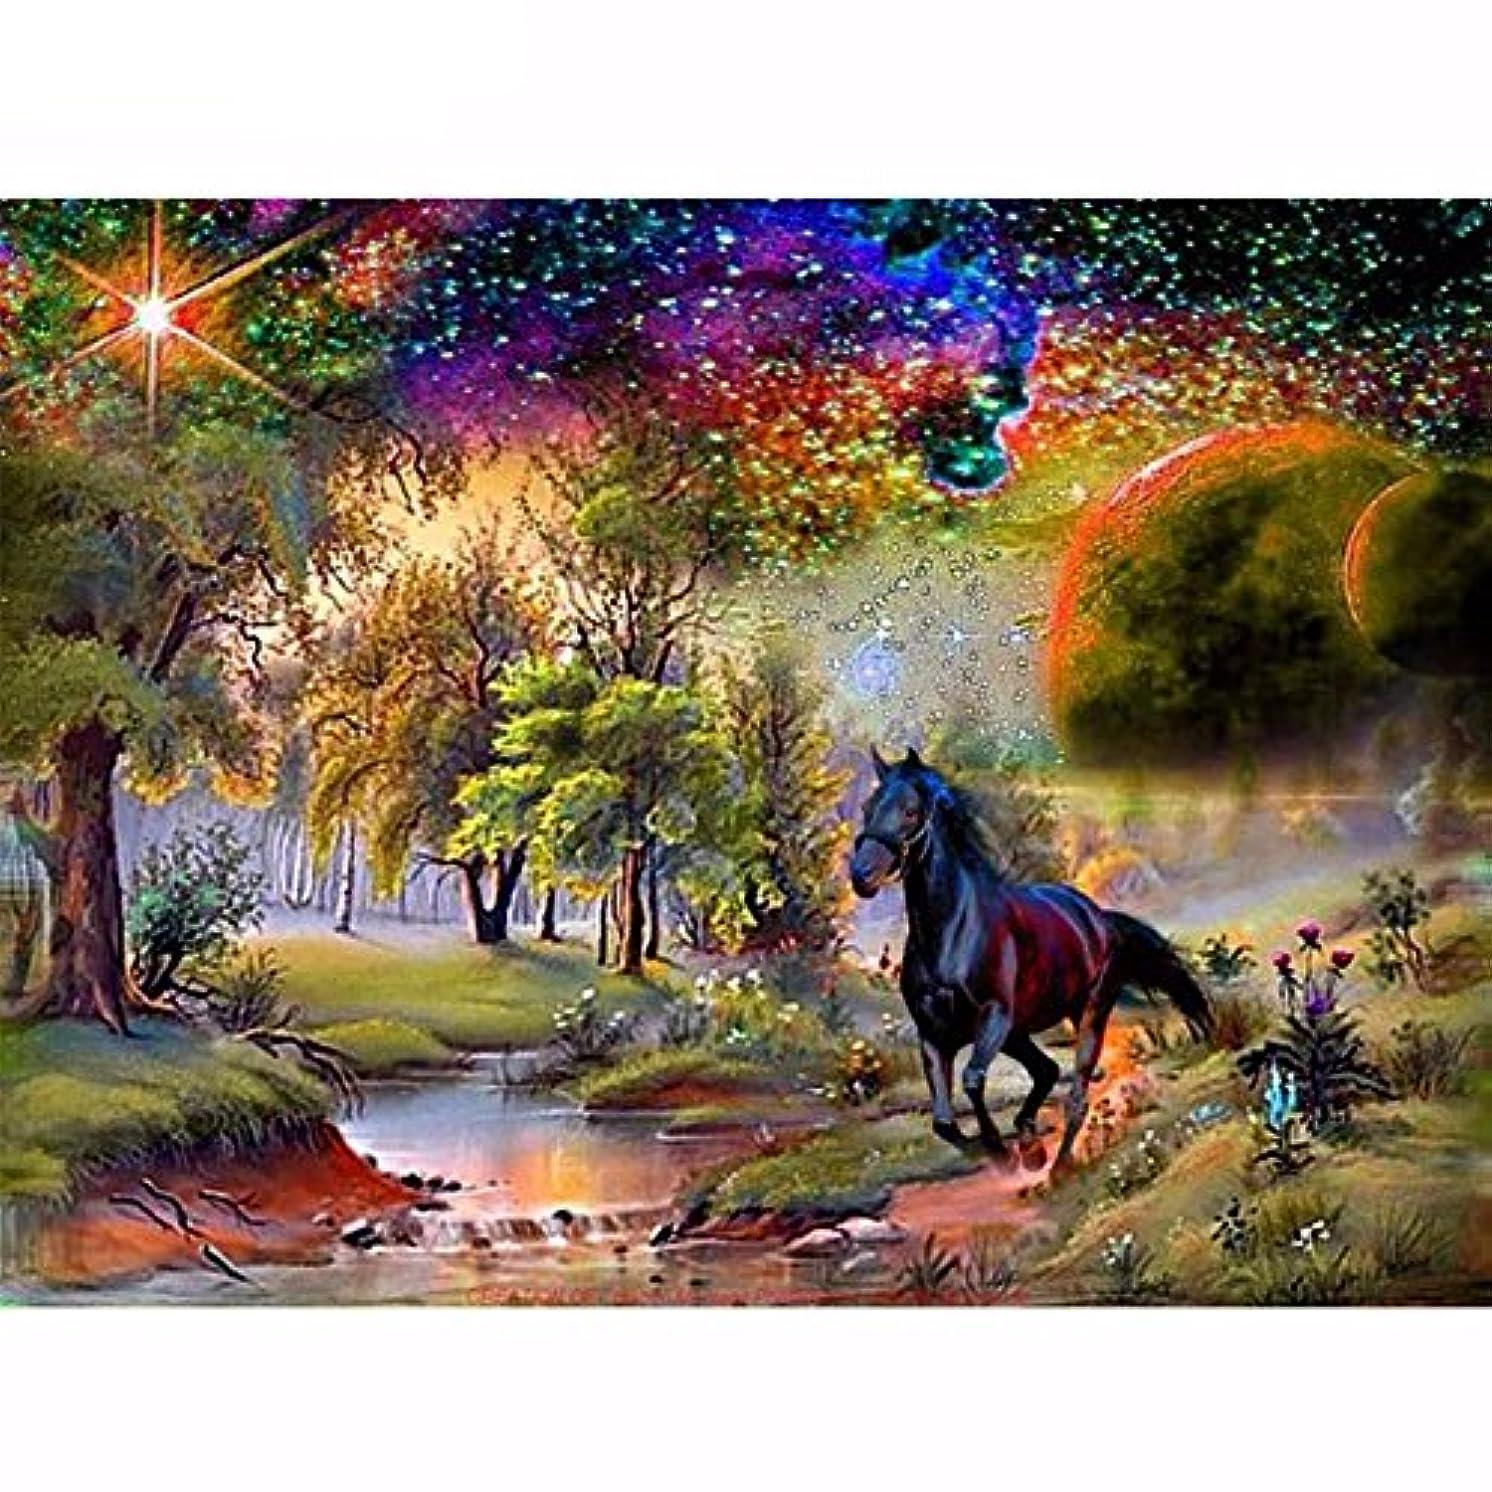 New 5D DIY Diamond Painting Black Horse Embroidery Full Diamond Cross Stitch Landscape Rhinestone Mosaic Painting Decor